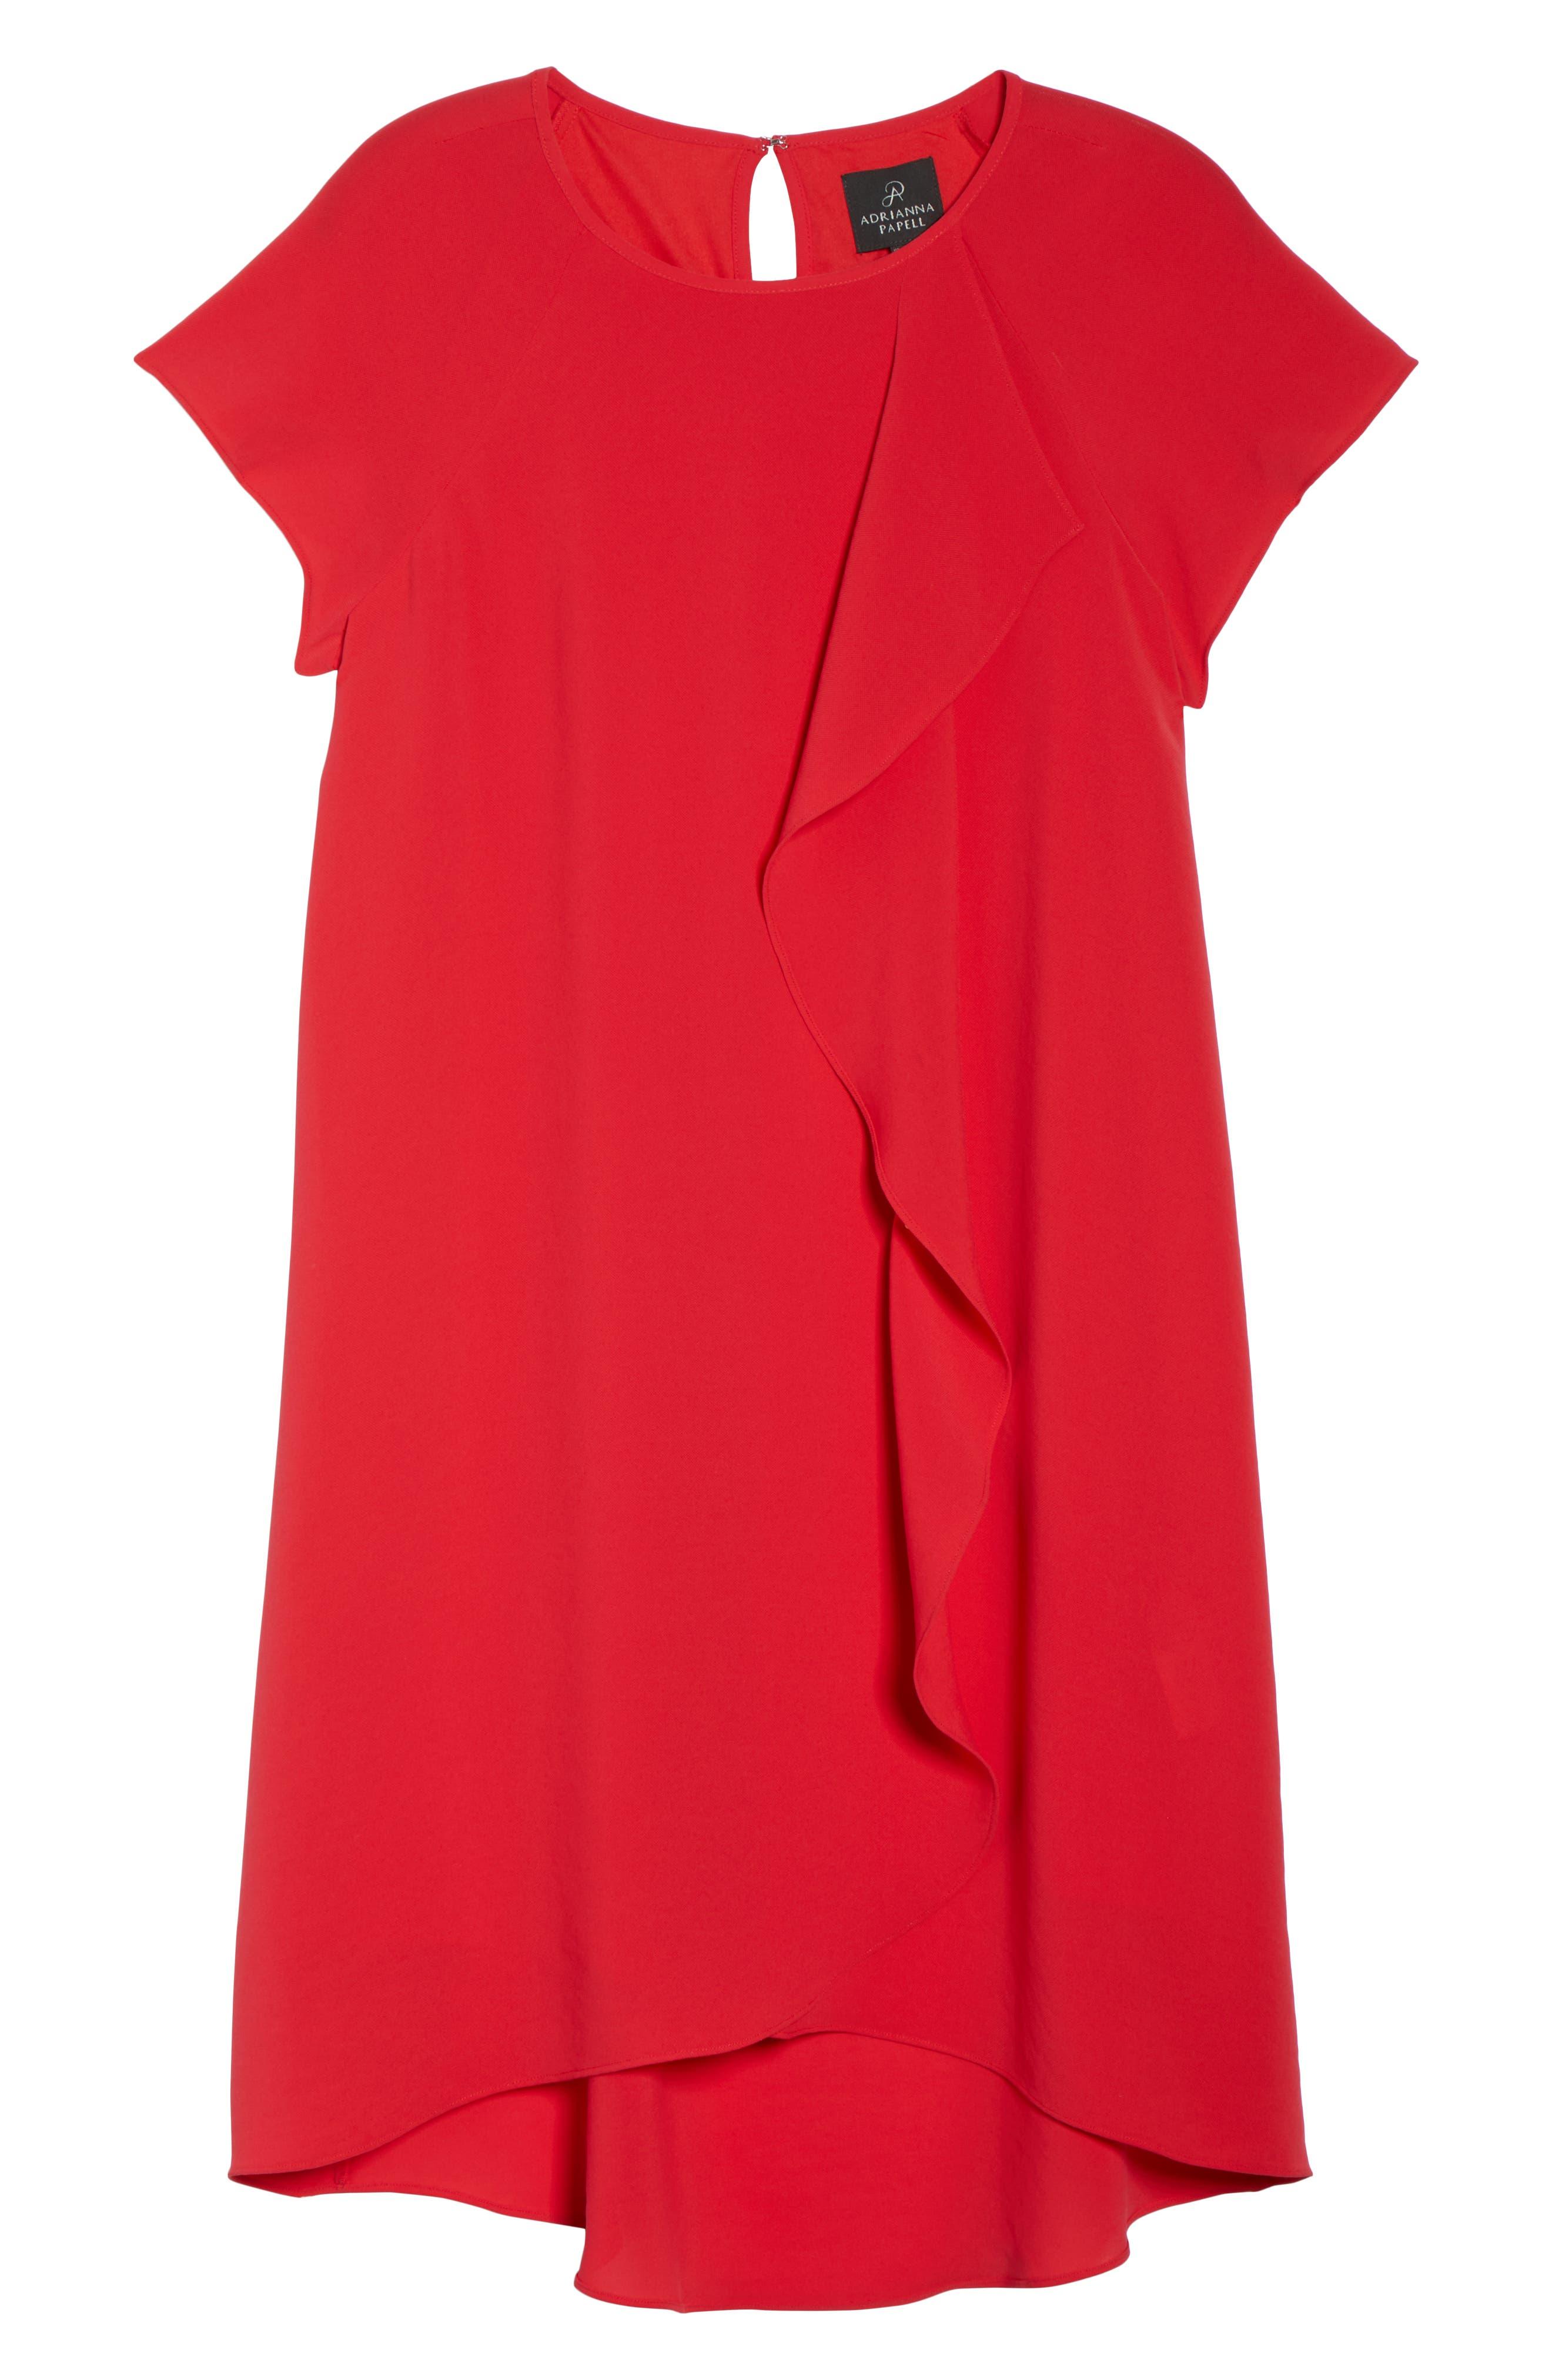 ADRIANNA PAPELL, Crepe Shift Dress, Alternate thumbnail 7, color, 650